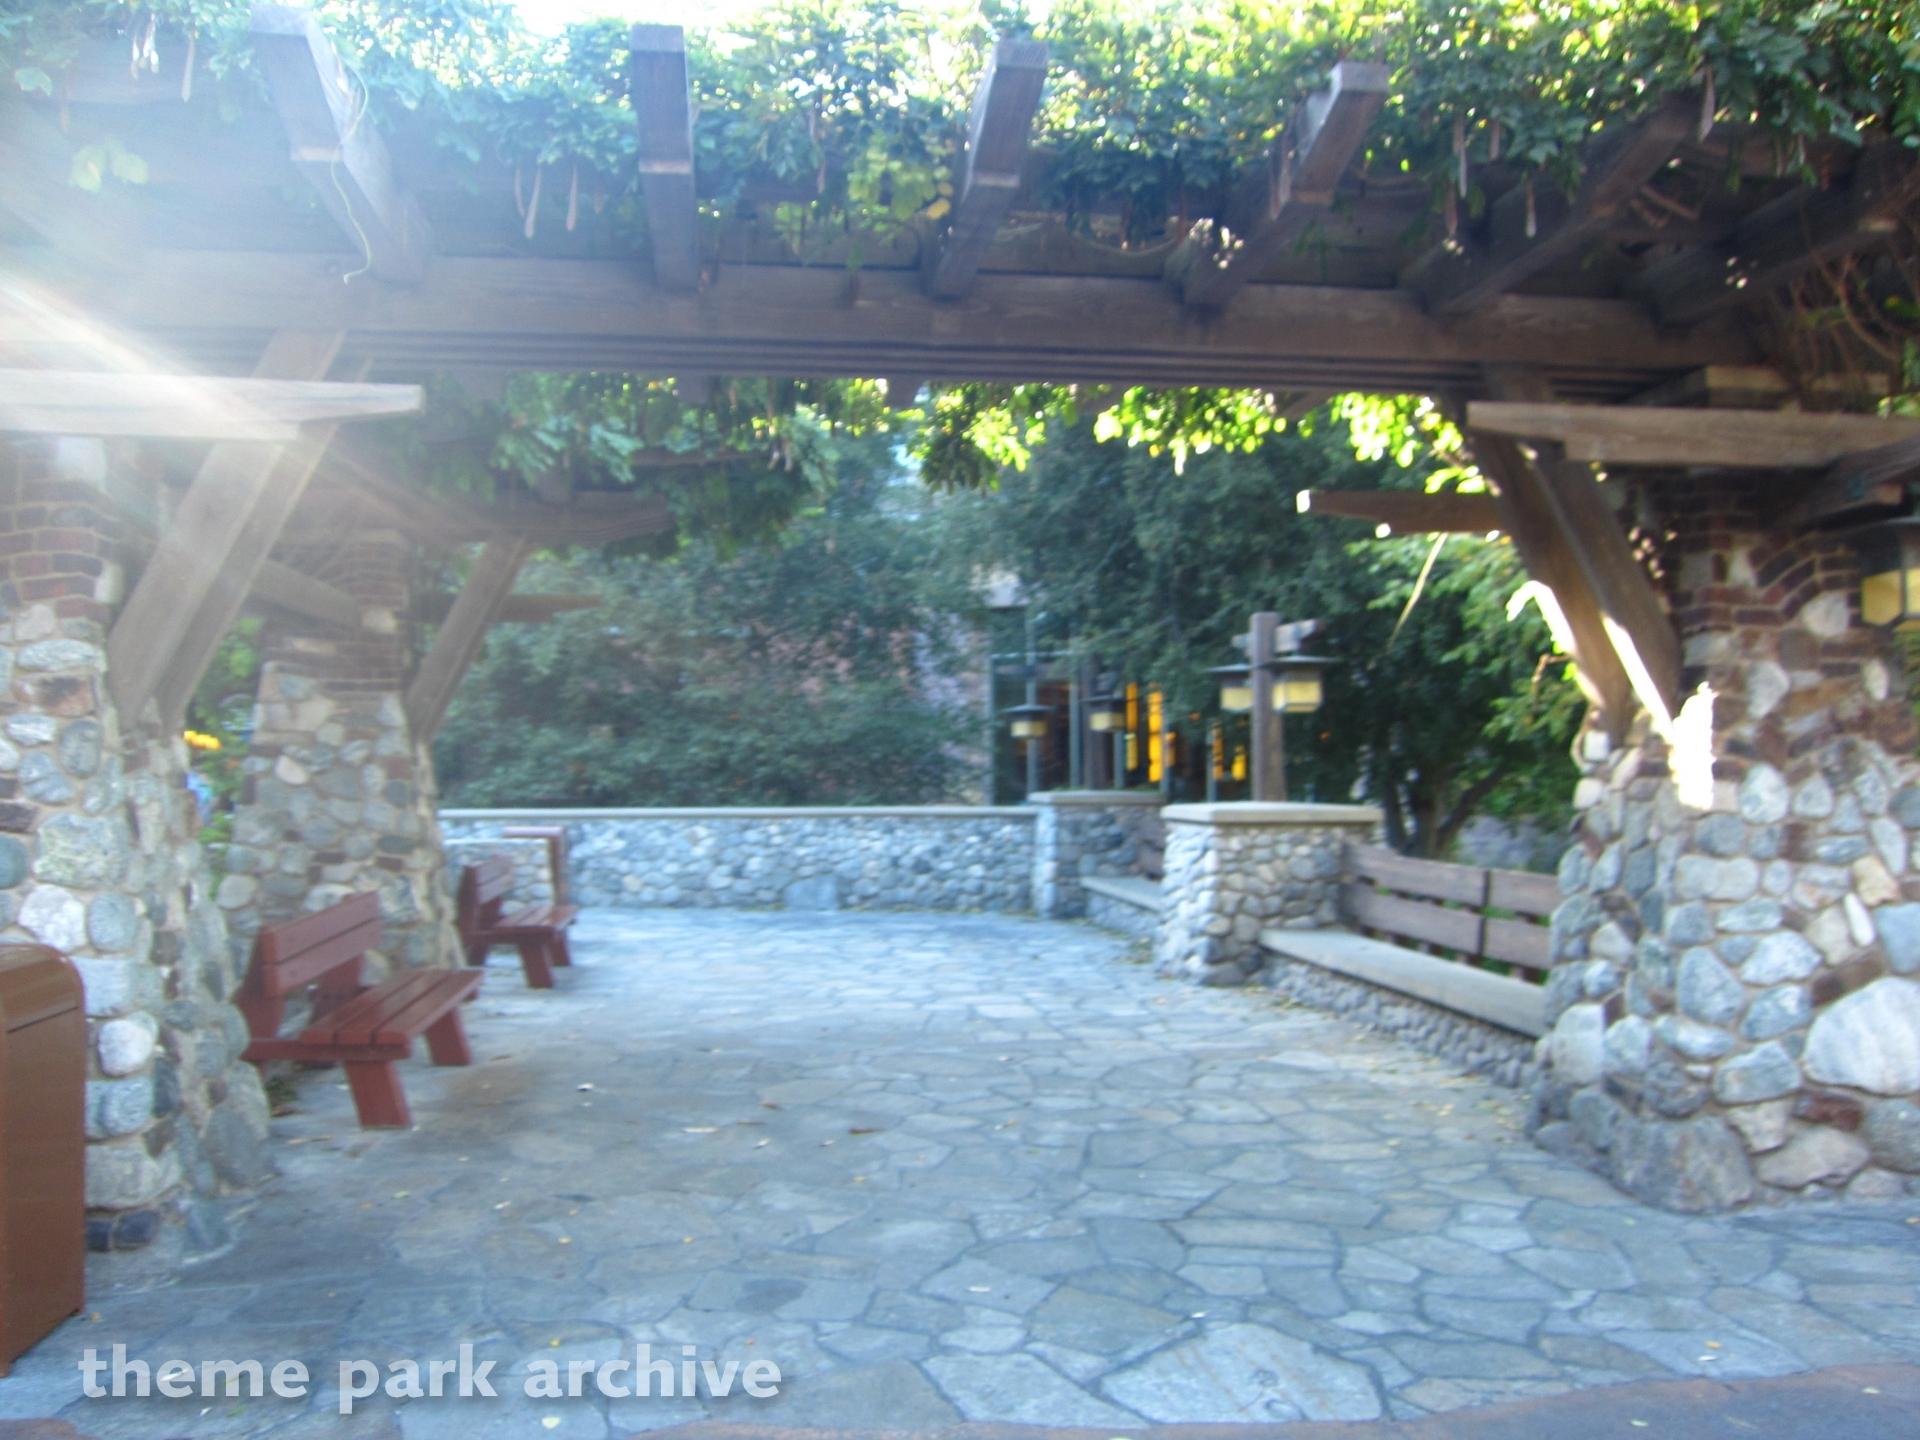 Grizzly Peak at Disney California Adventure